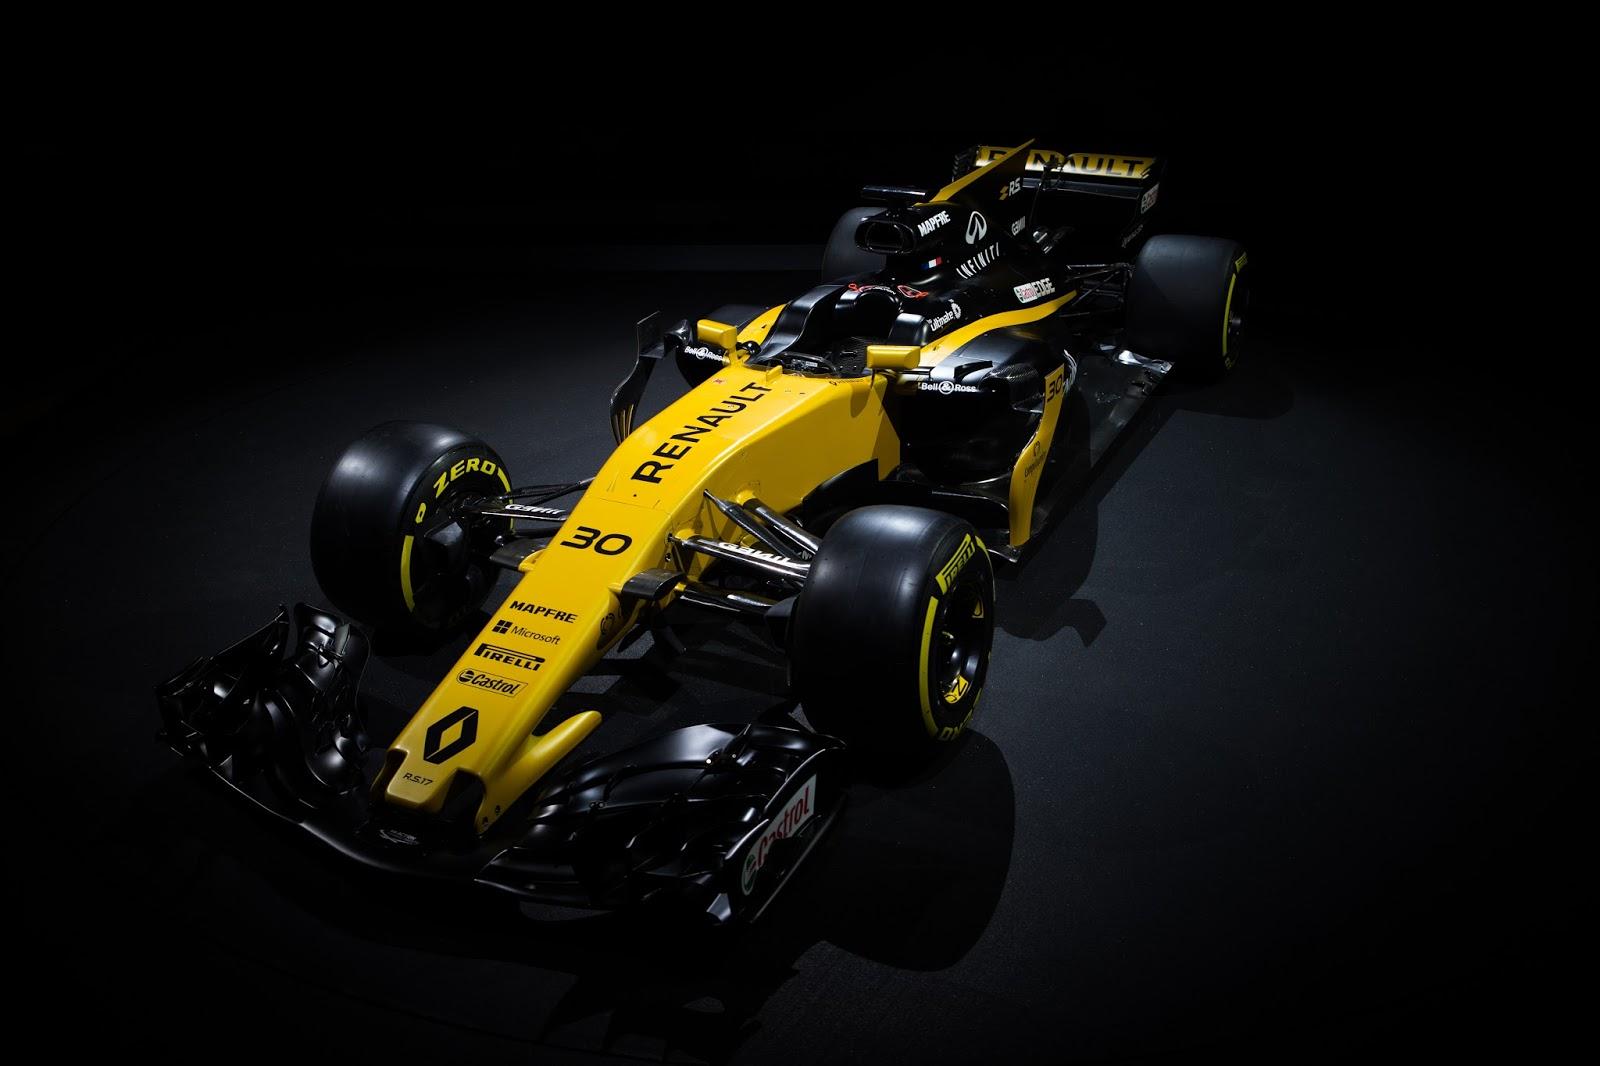 210217 RL 009 Η Renault Sport παρουσίασε το καινούργιο της μονοθέσιο, την R.S.17 F1, Formula 1, Renault, Renault Sport Formula 1 Team, videos